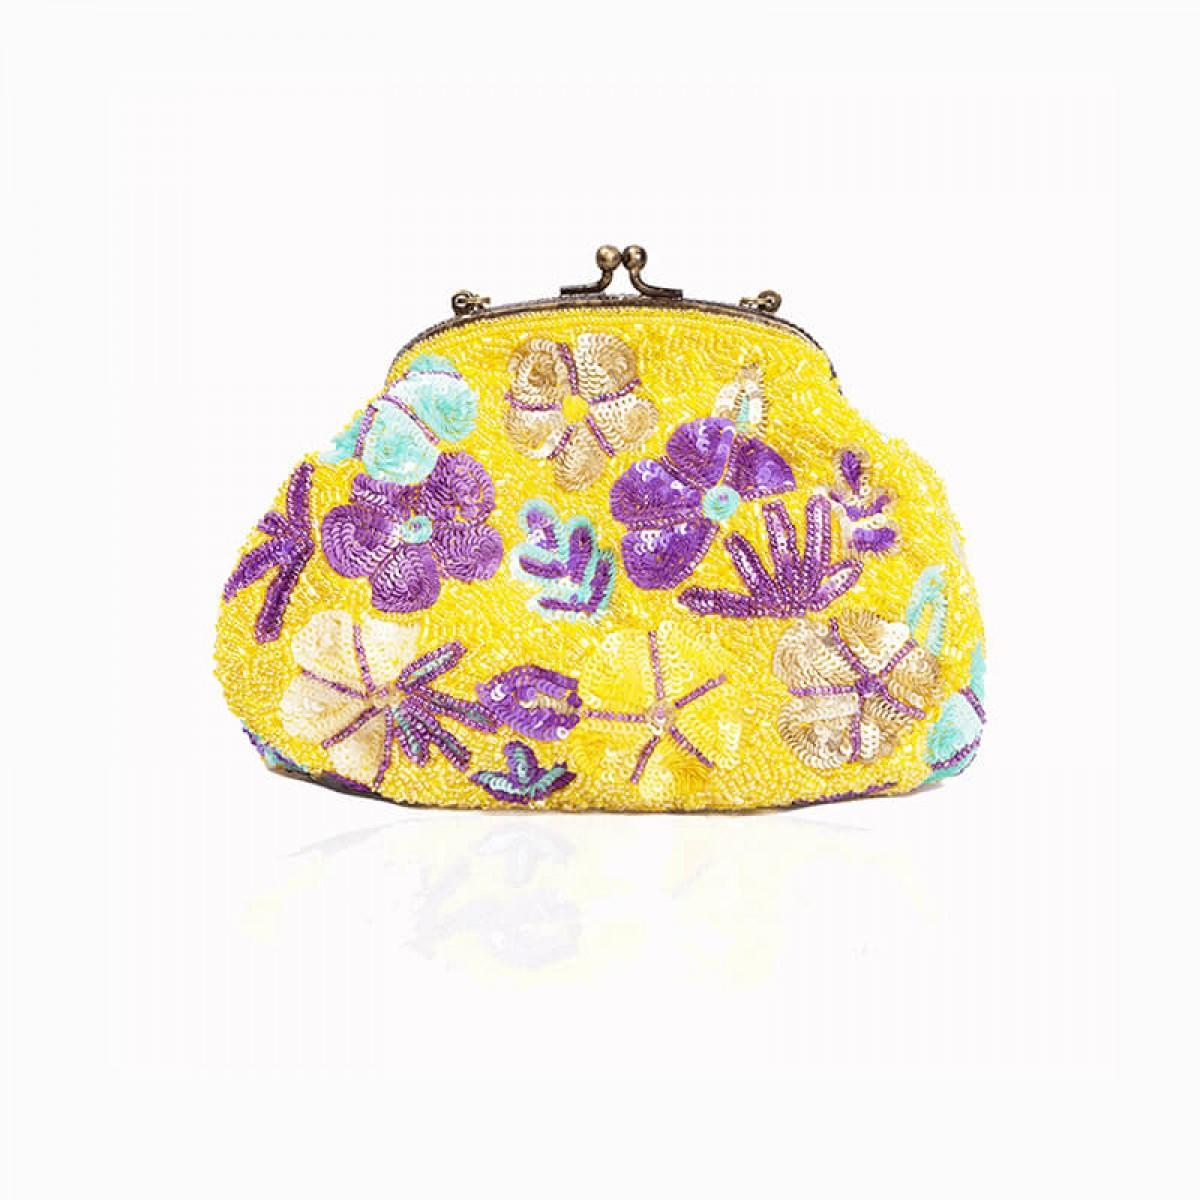 Beaded Sequin Flower Handbag - Yellow